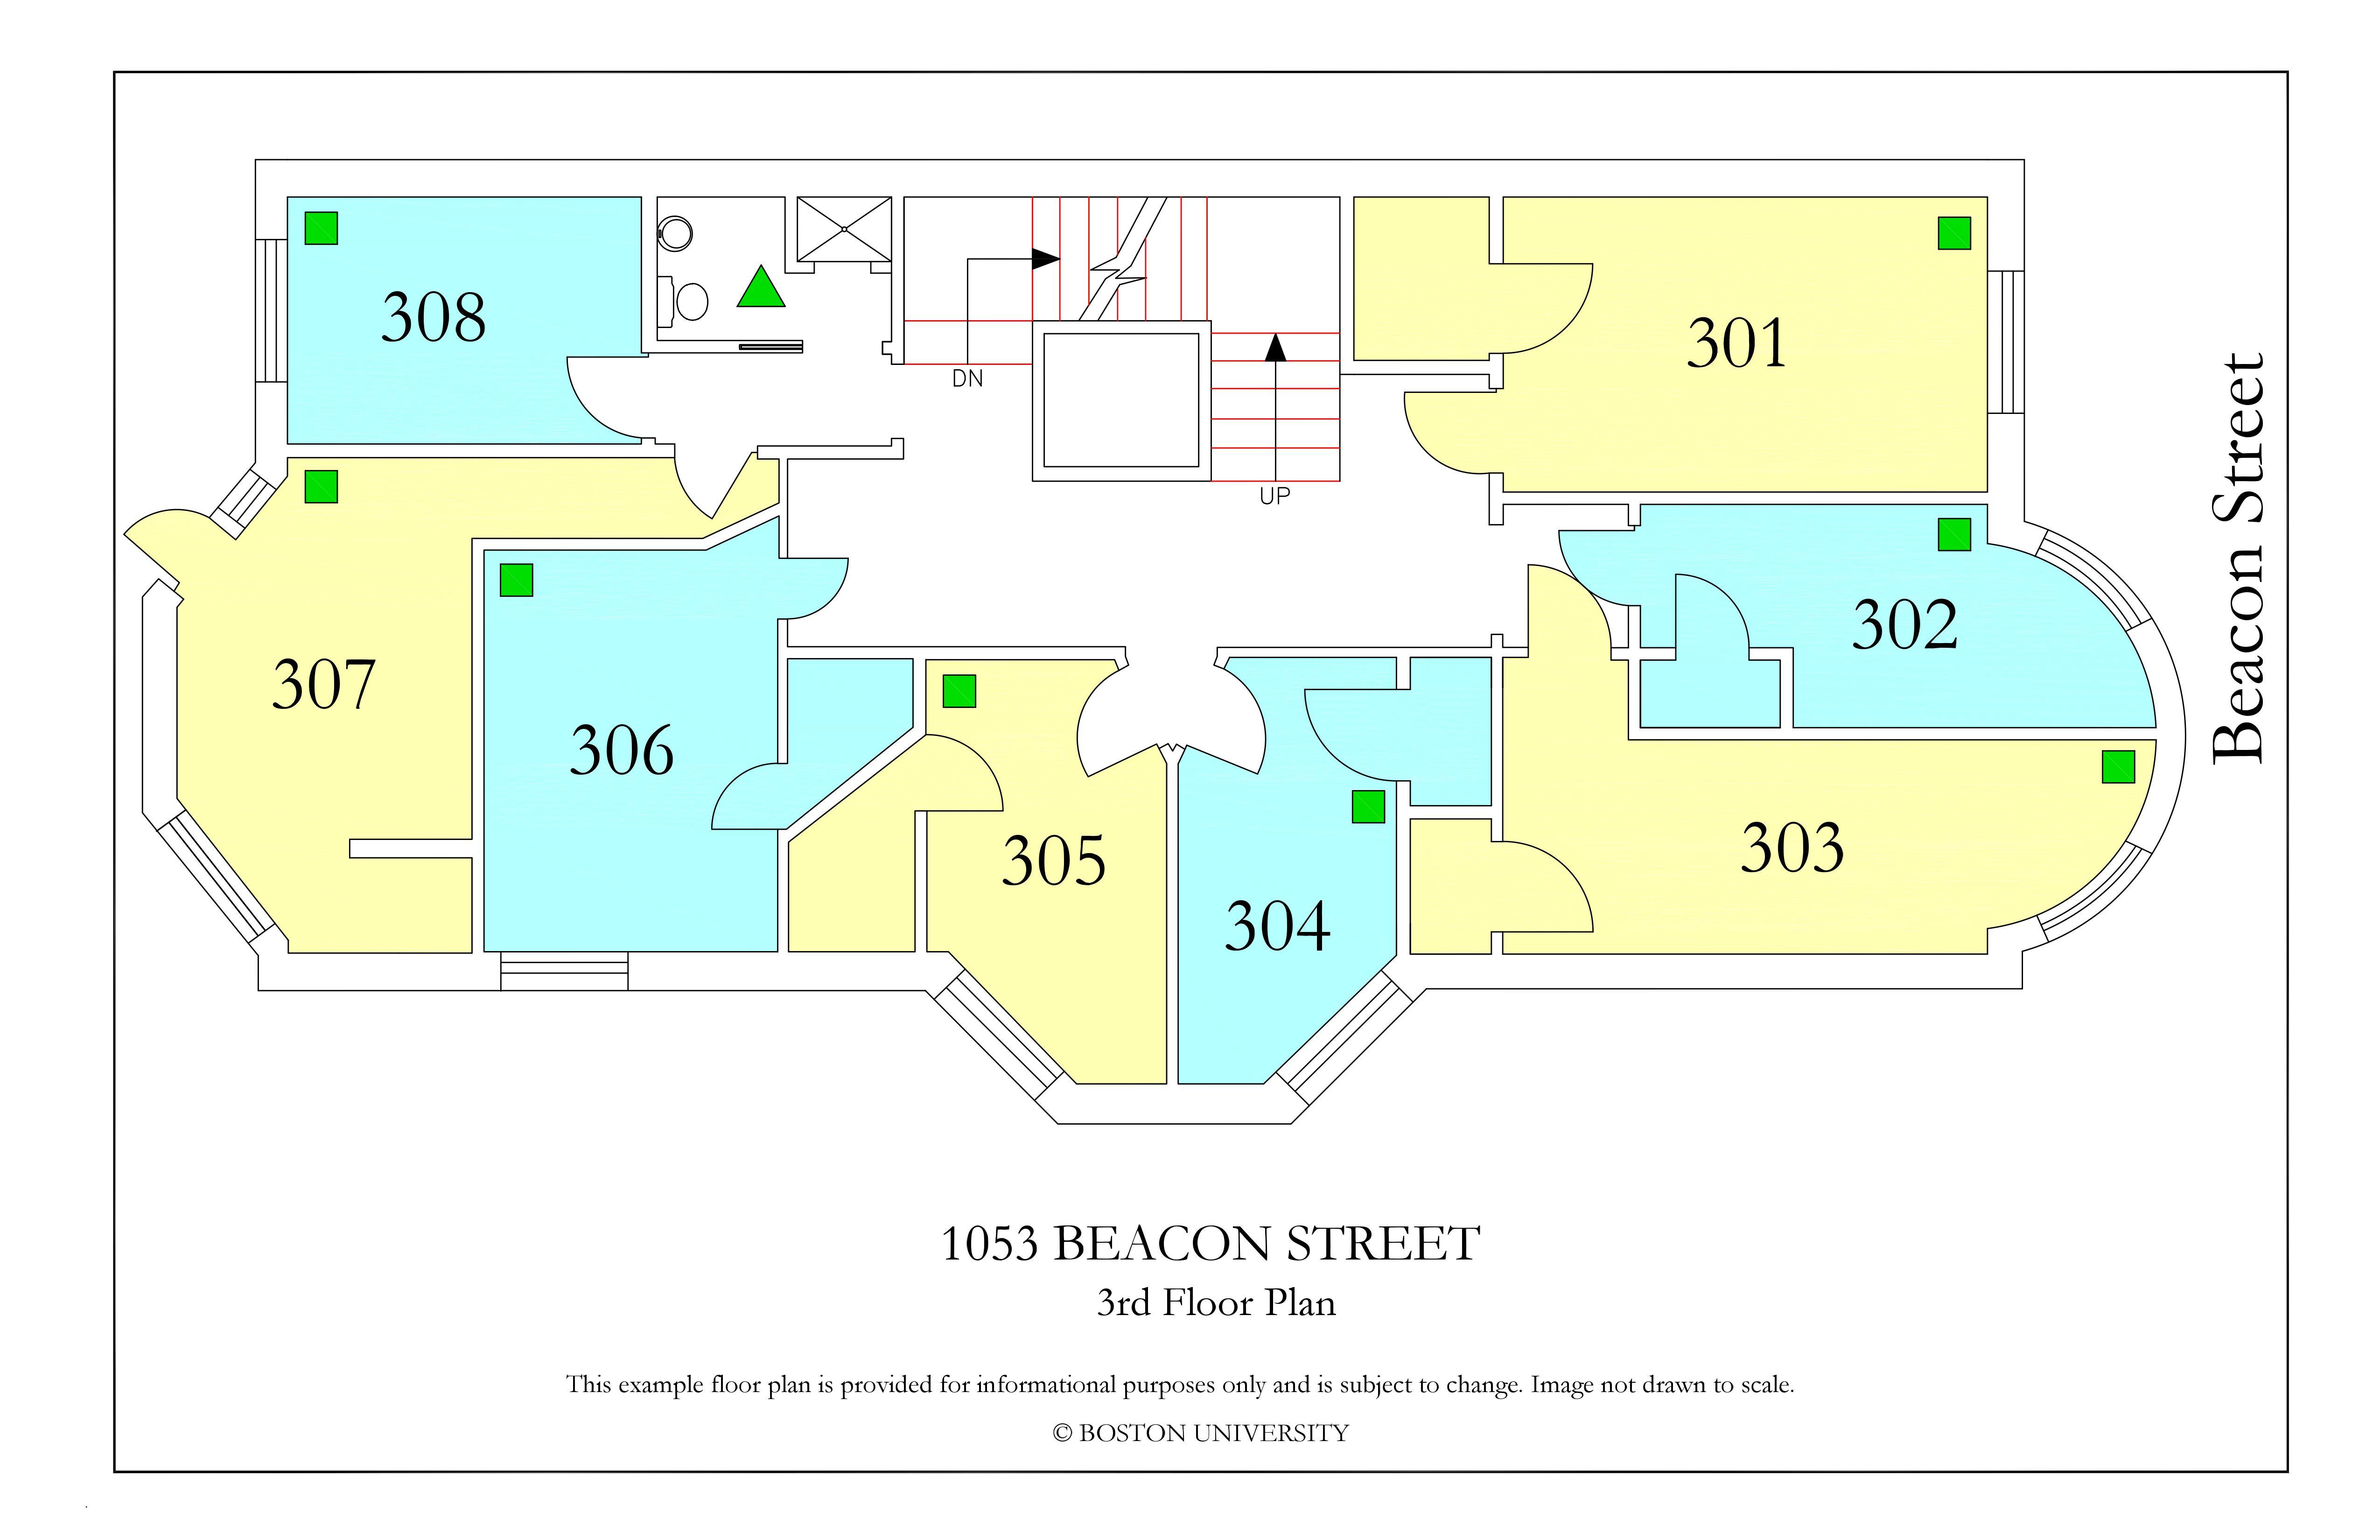 1053 Beacon Street